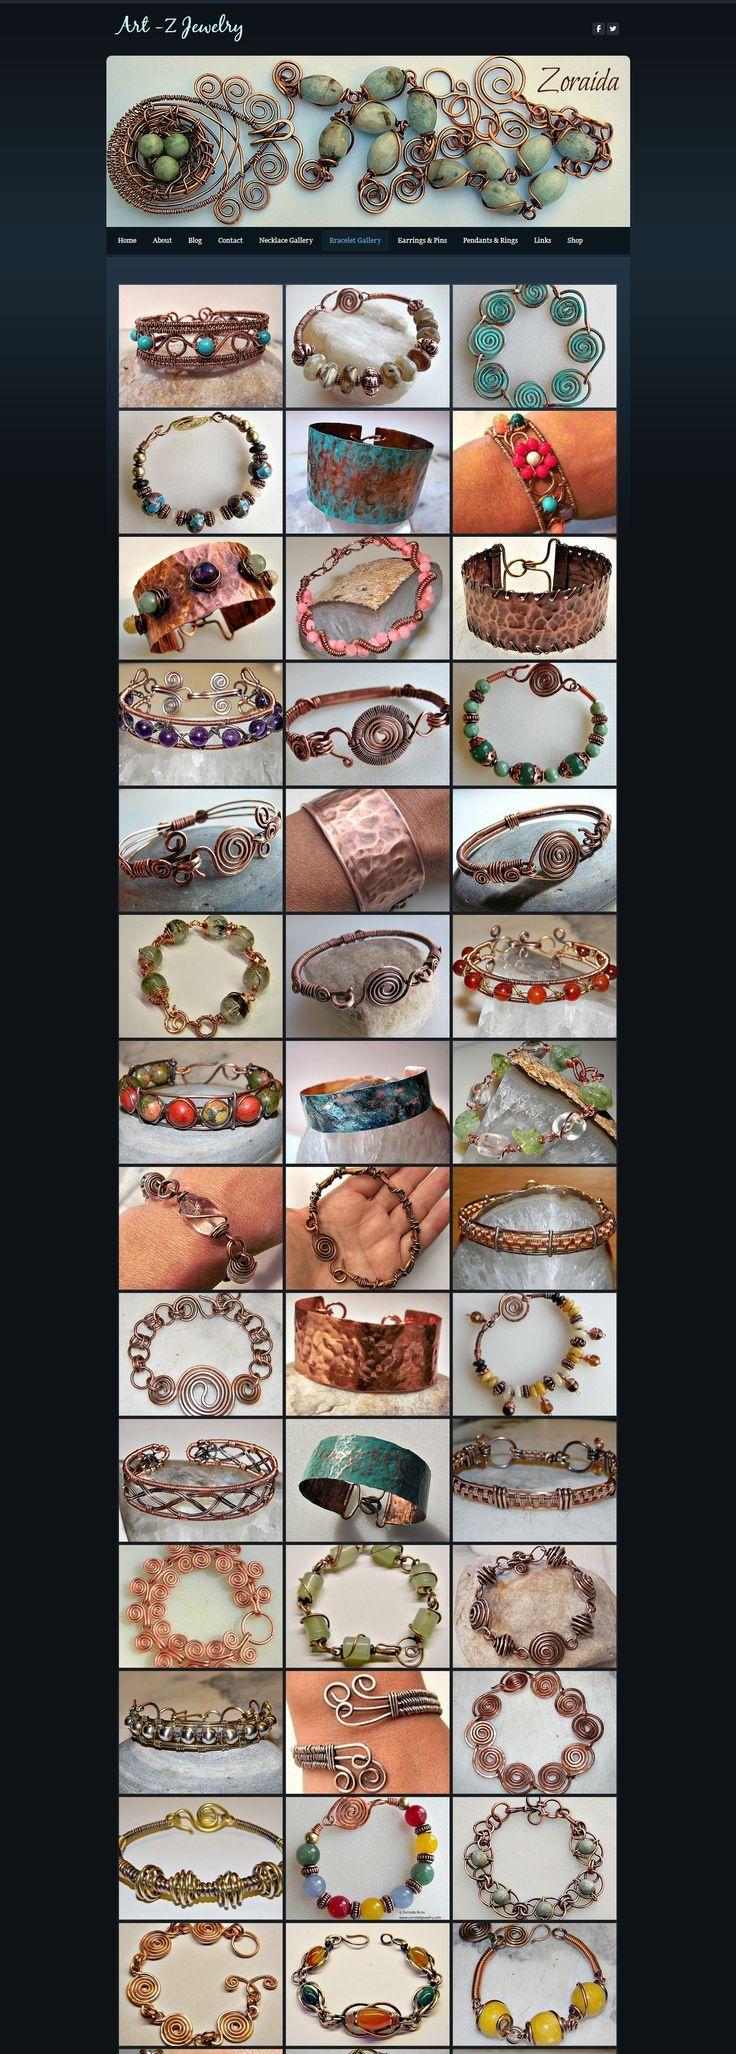 Art-Z Jewelry - Wire Work Bracelets (pictures - page 1) - Do It Darling